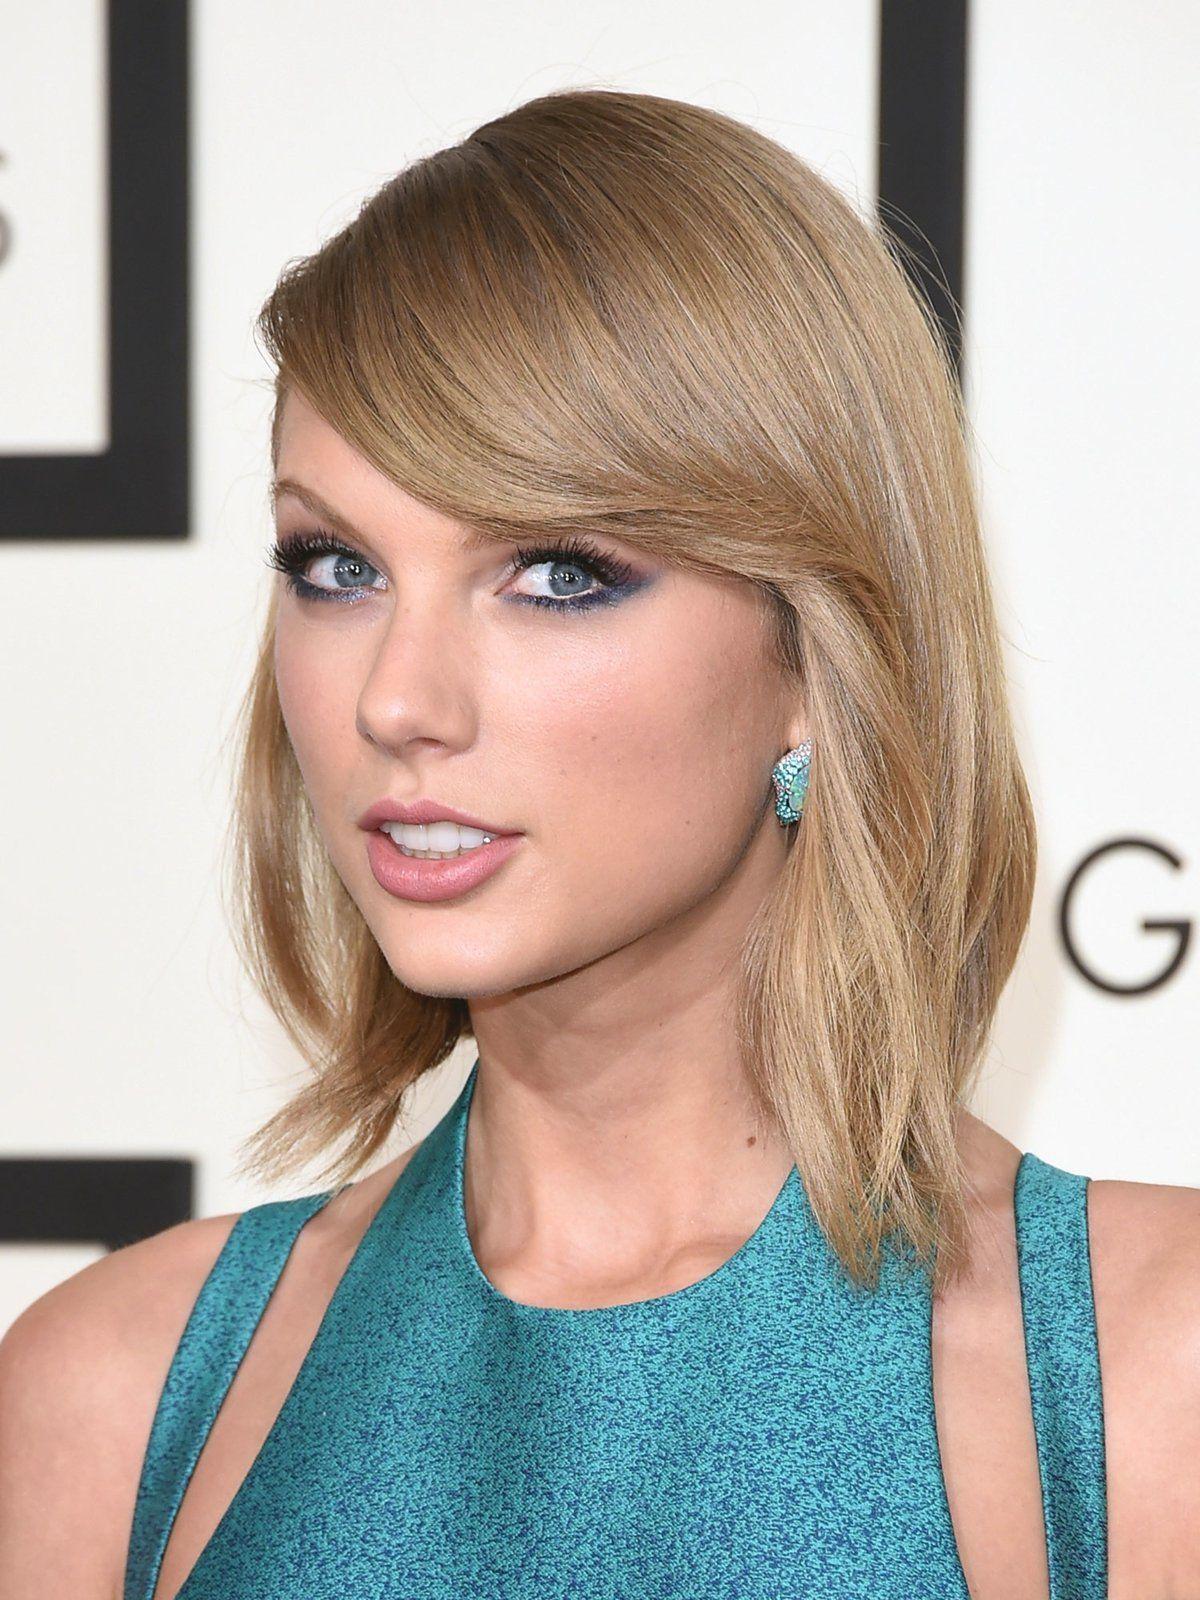 Taylor Swift Frisur Mittellang Hair Taylor Swift Taylor